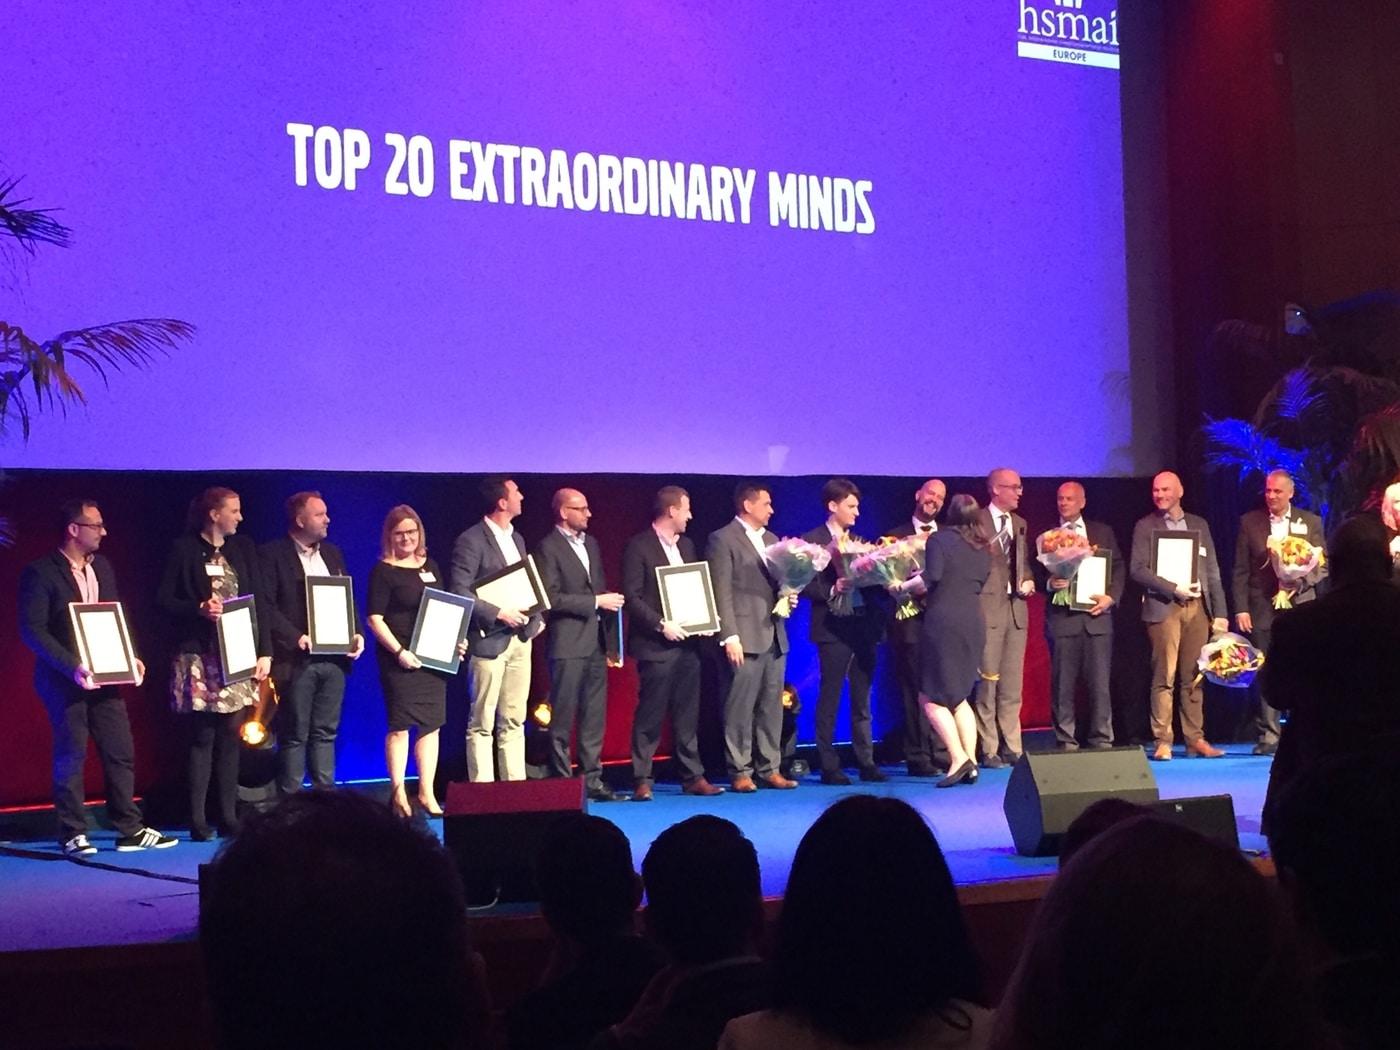 OTA Insight announces win in HSMAI Awards 2017